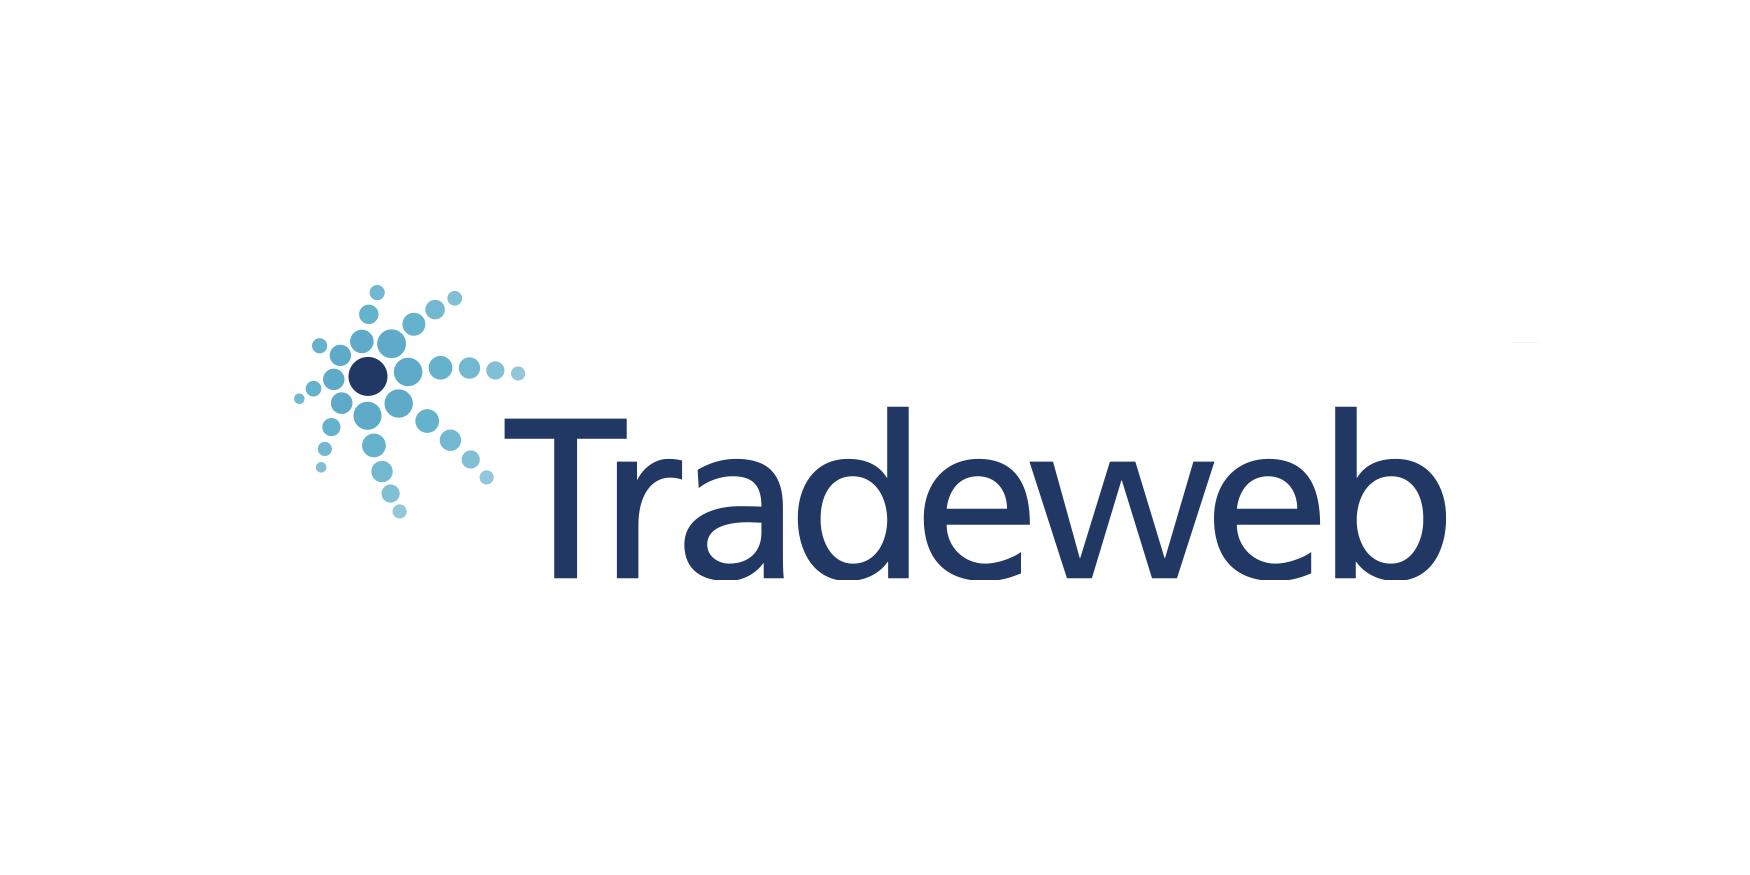 tradeweb[H]